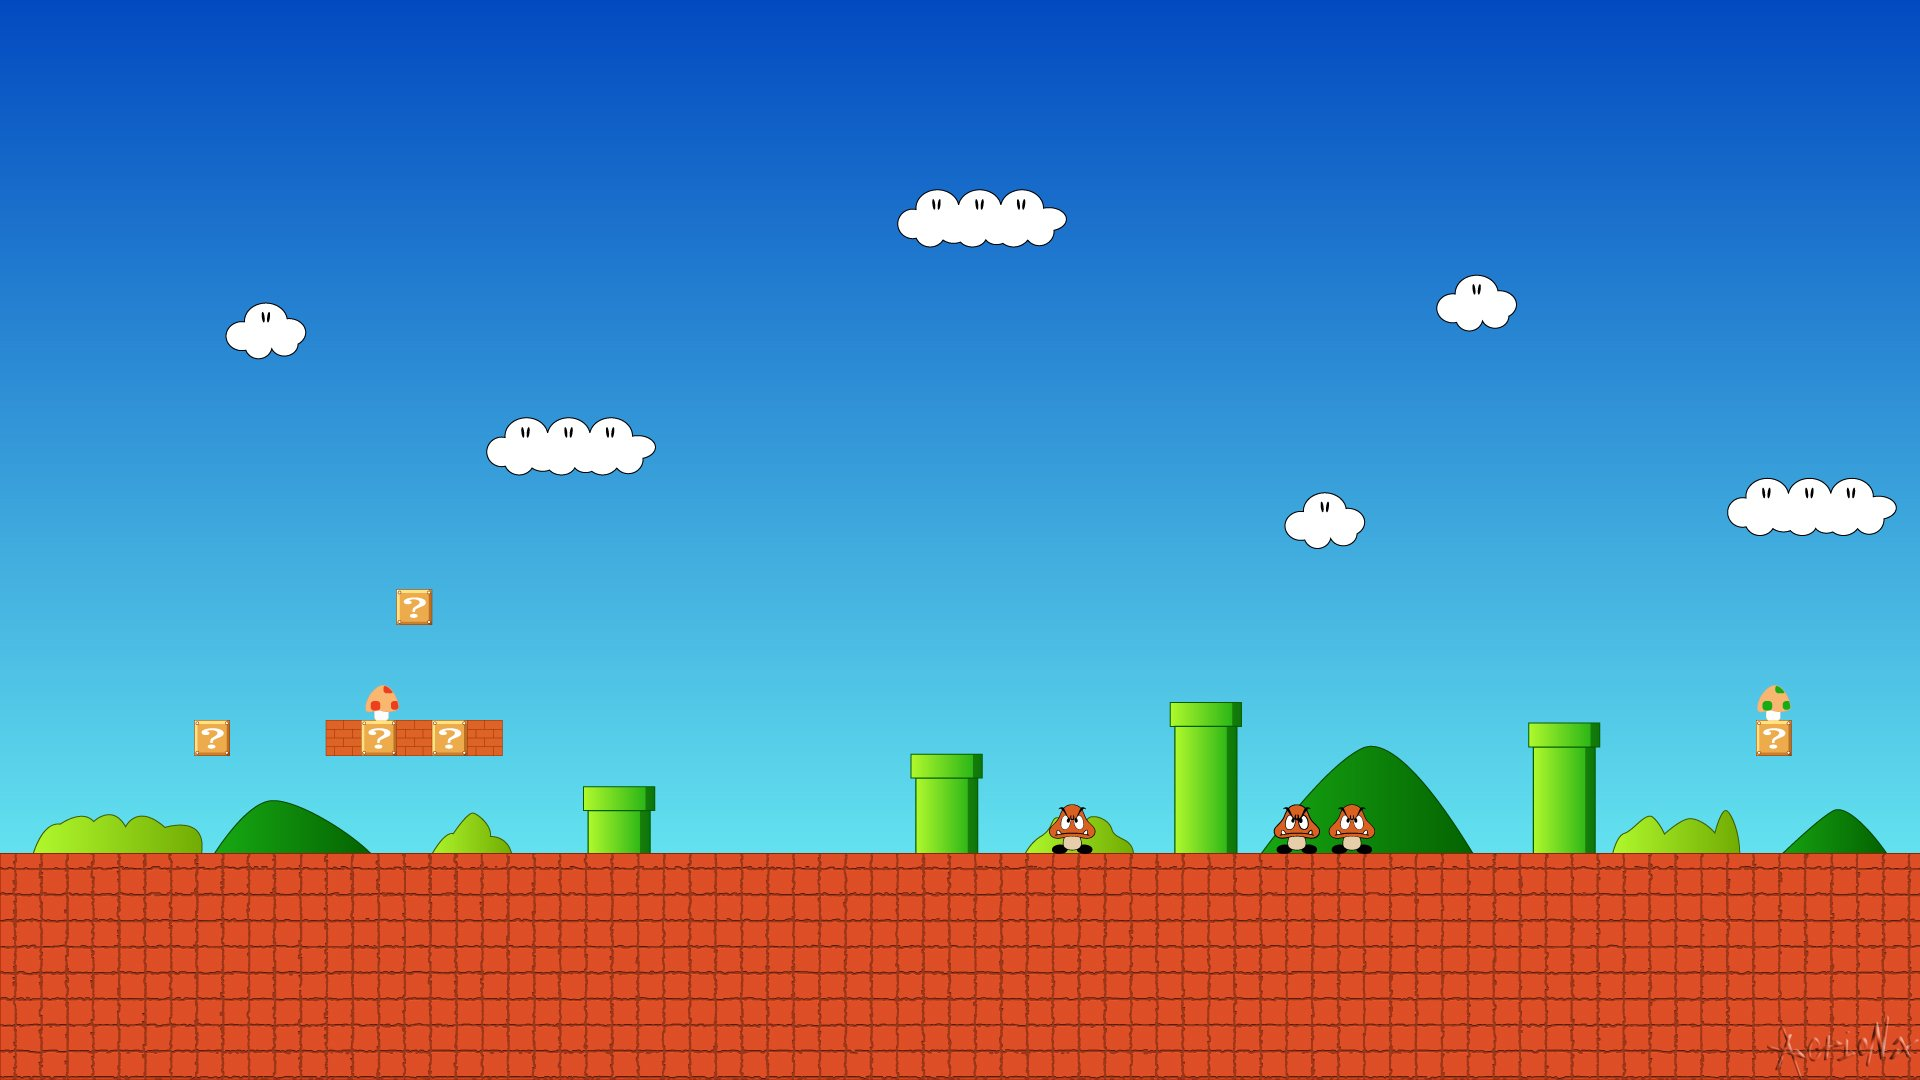 Super Mario Wallpaper Iphone 5 Super Mario Bros Full Hd Fondo De Pantalla And Fondo De